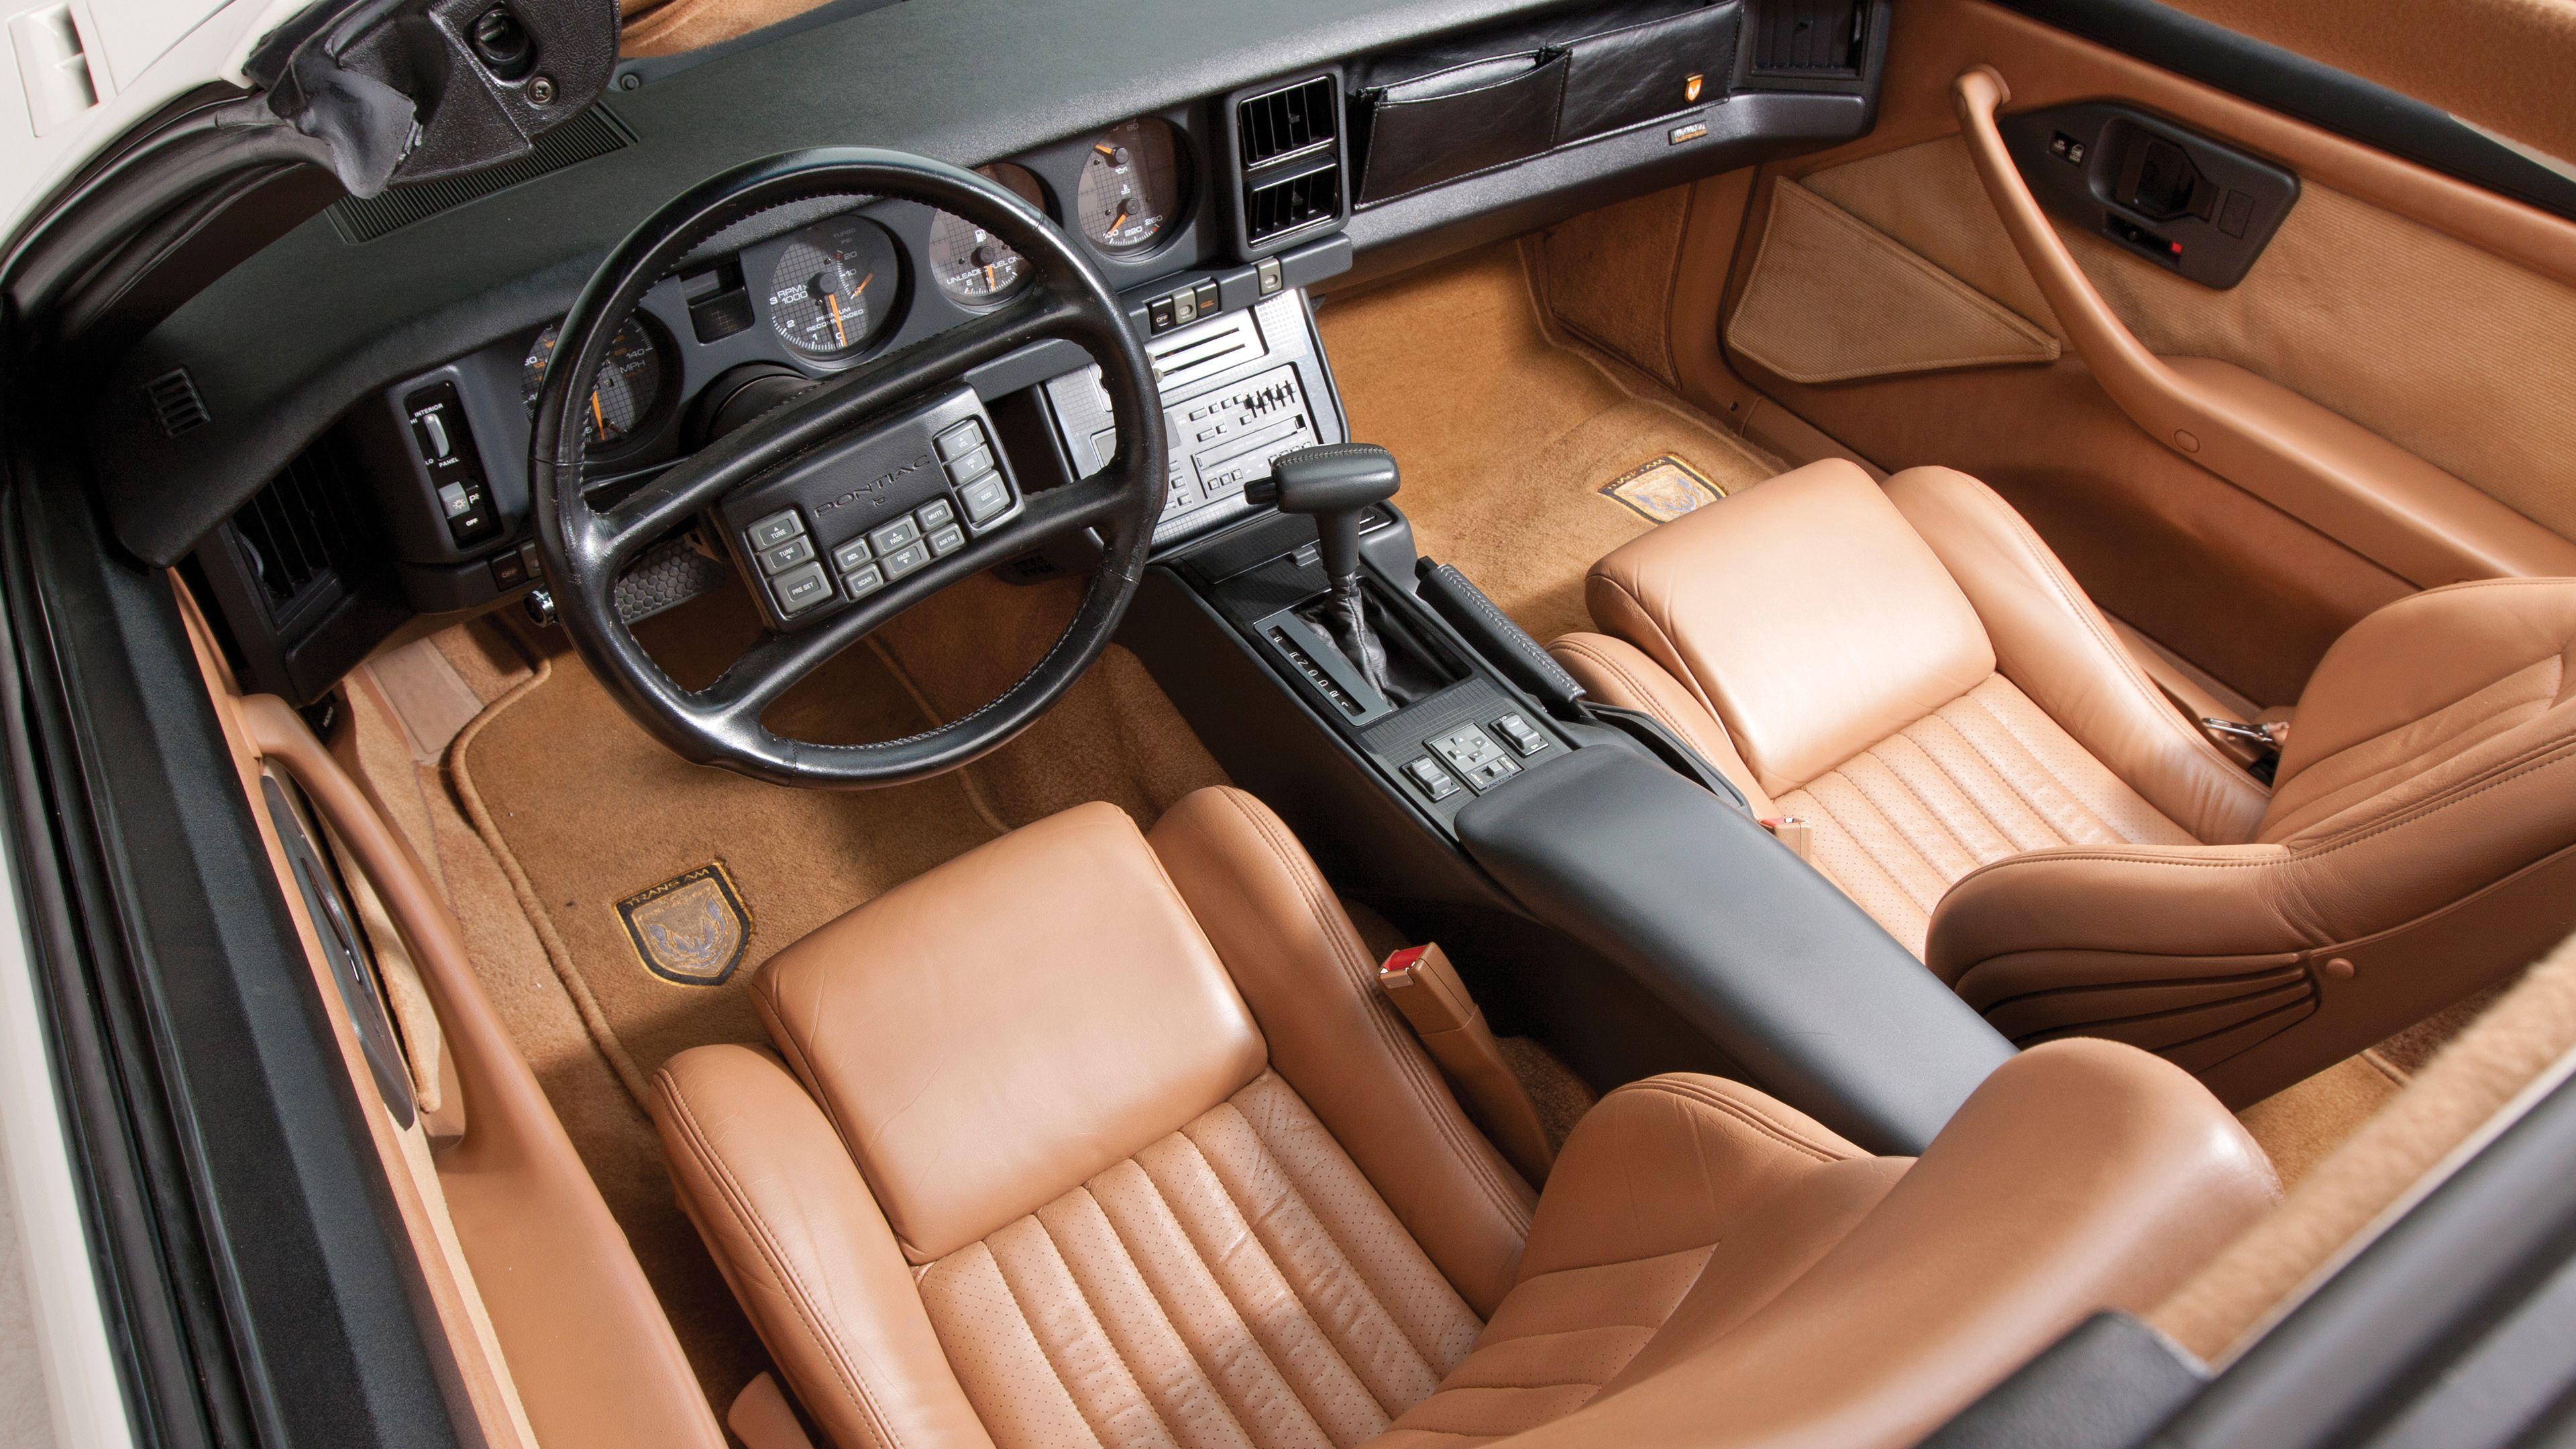 Pontiac Firebird Turbo Trans Am Coupe 1989 Trans Am Gta Trans Am Pontiac Firebird Trans Am